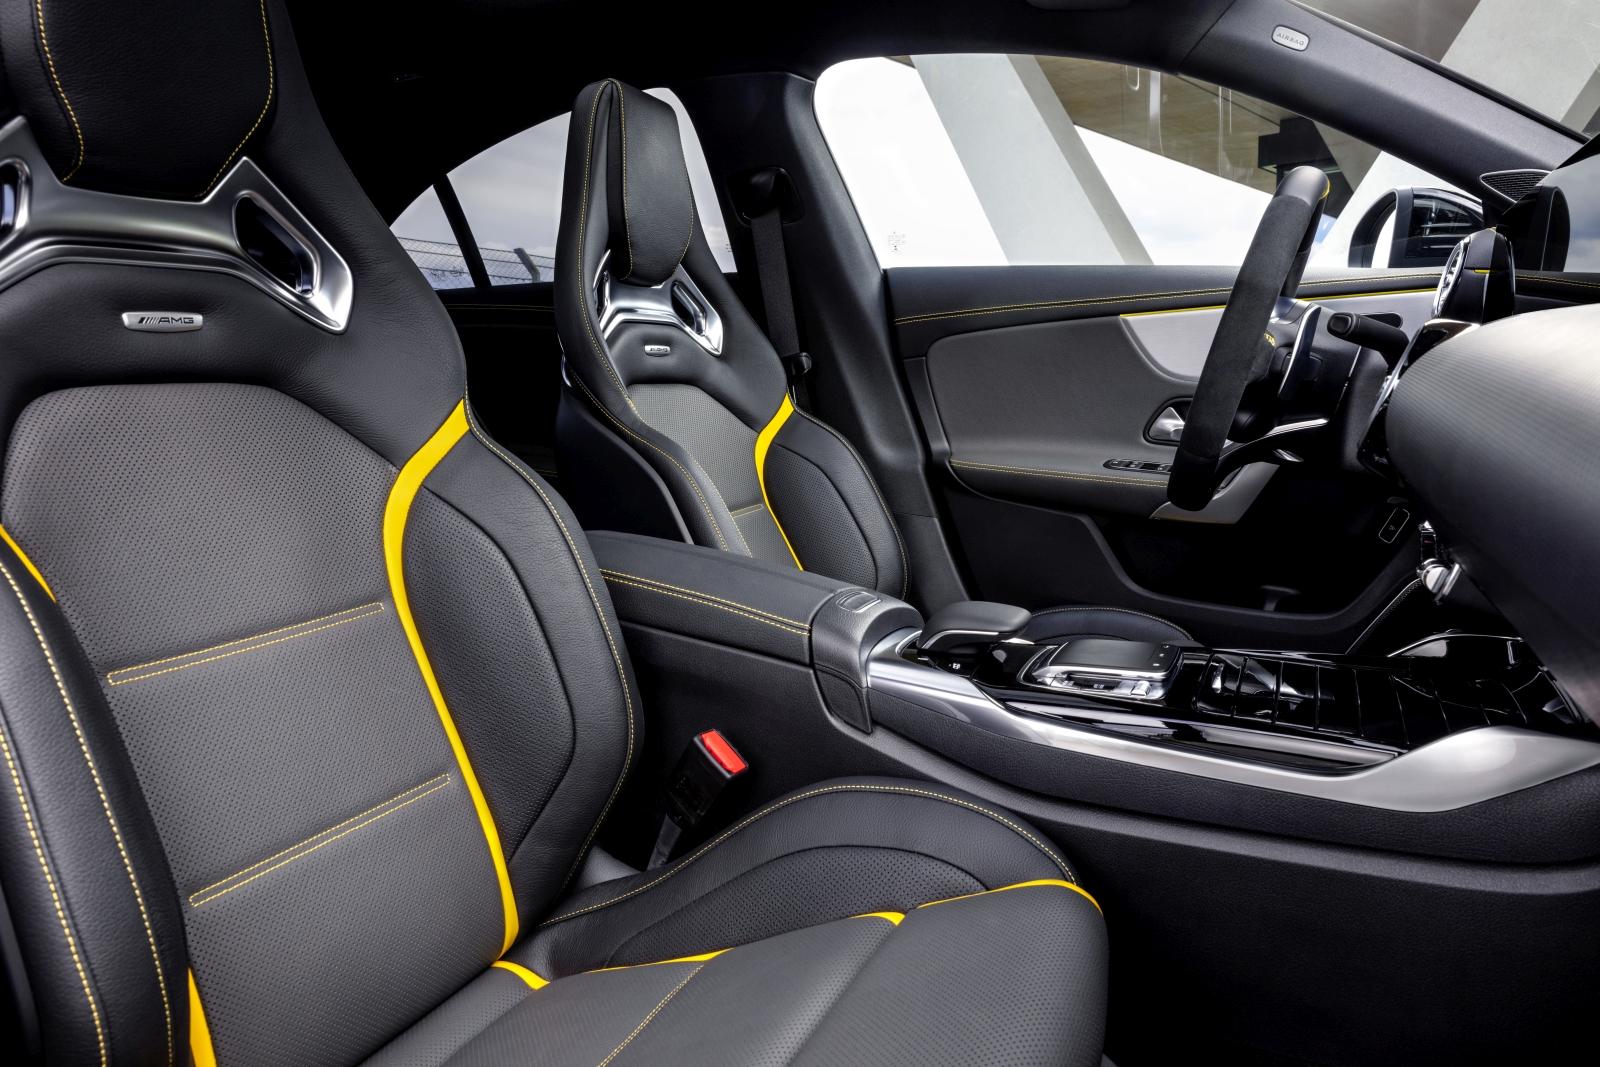 Mercedes-AMG A 45, A 45 S, CLA 45, CLA 45 S 4MATIC+